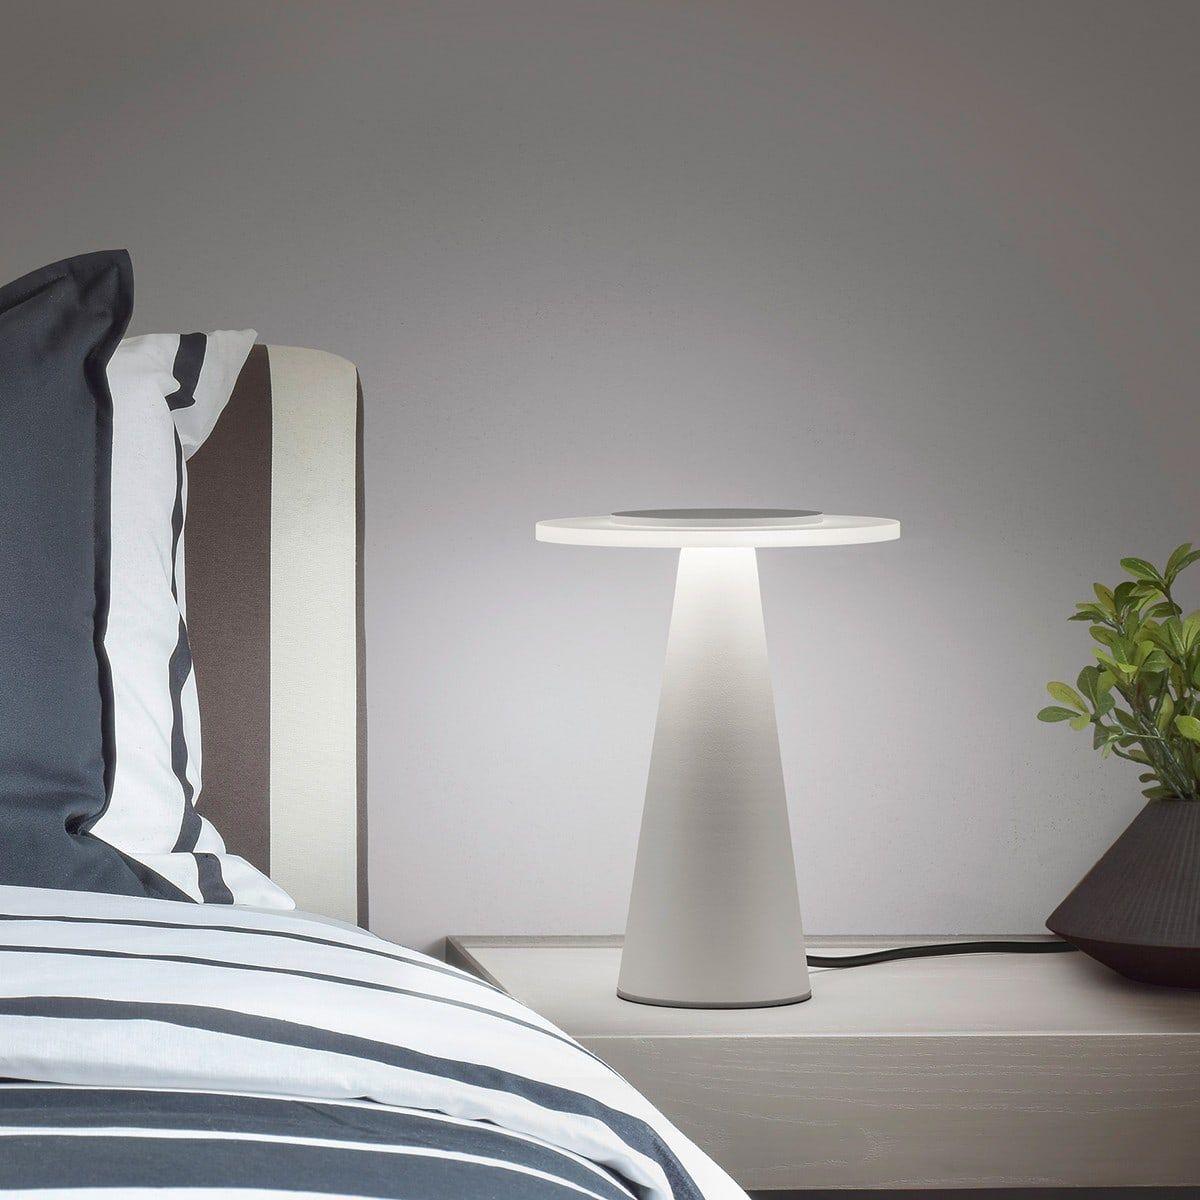 led leuchten dimmbar esszimmer  moderne lampen wohnzimmer